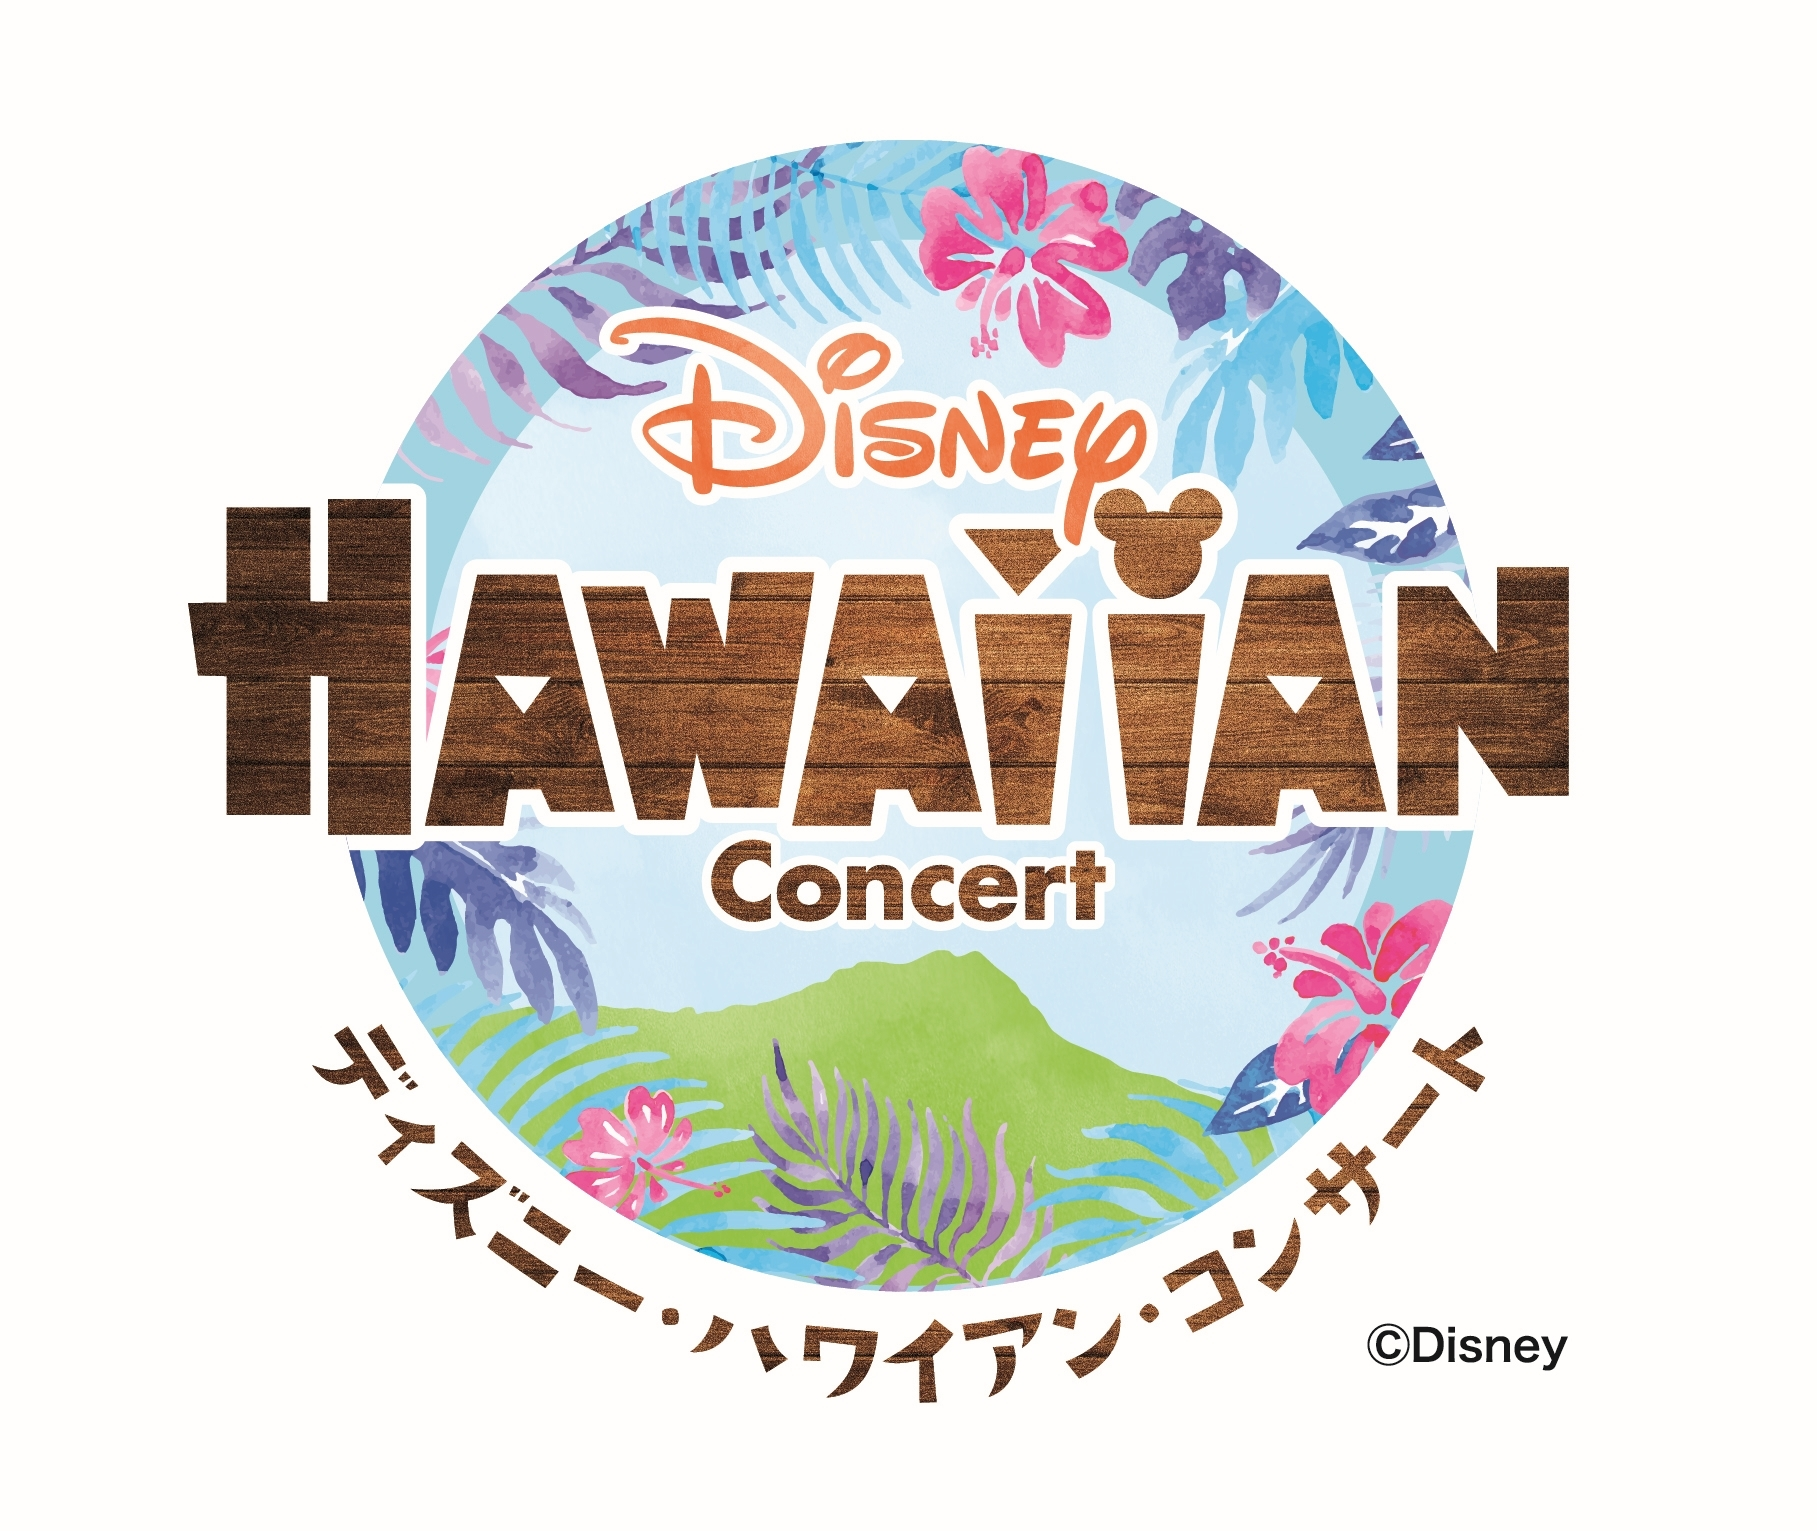 Disney HAWAIIAN Concert 2017 〜ディズニー映画最新作『モアナと伝説の海』公開記念〜